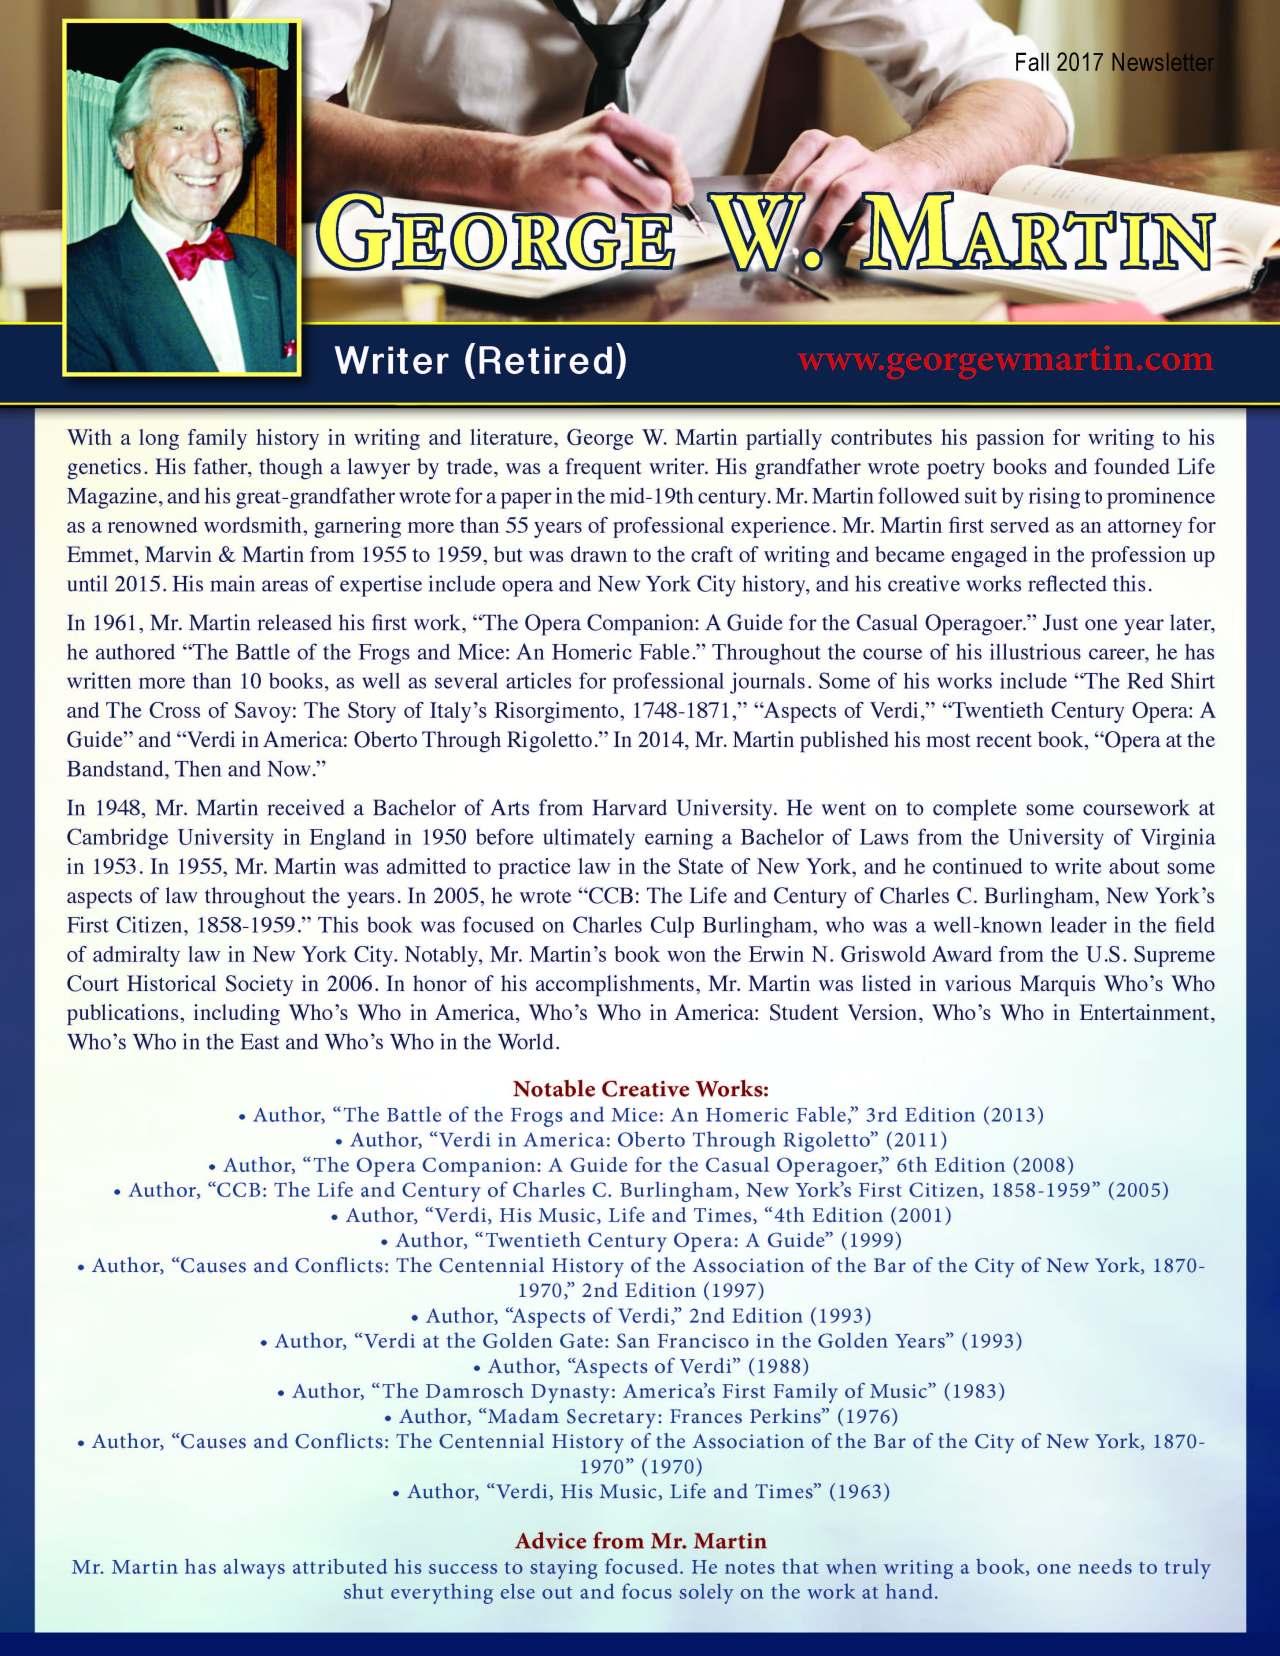 Martin, George 2164498_2501200 Newsletter.jpg